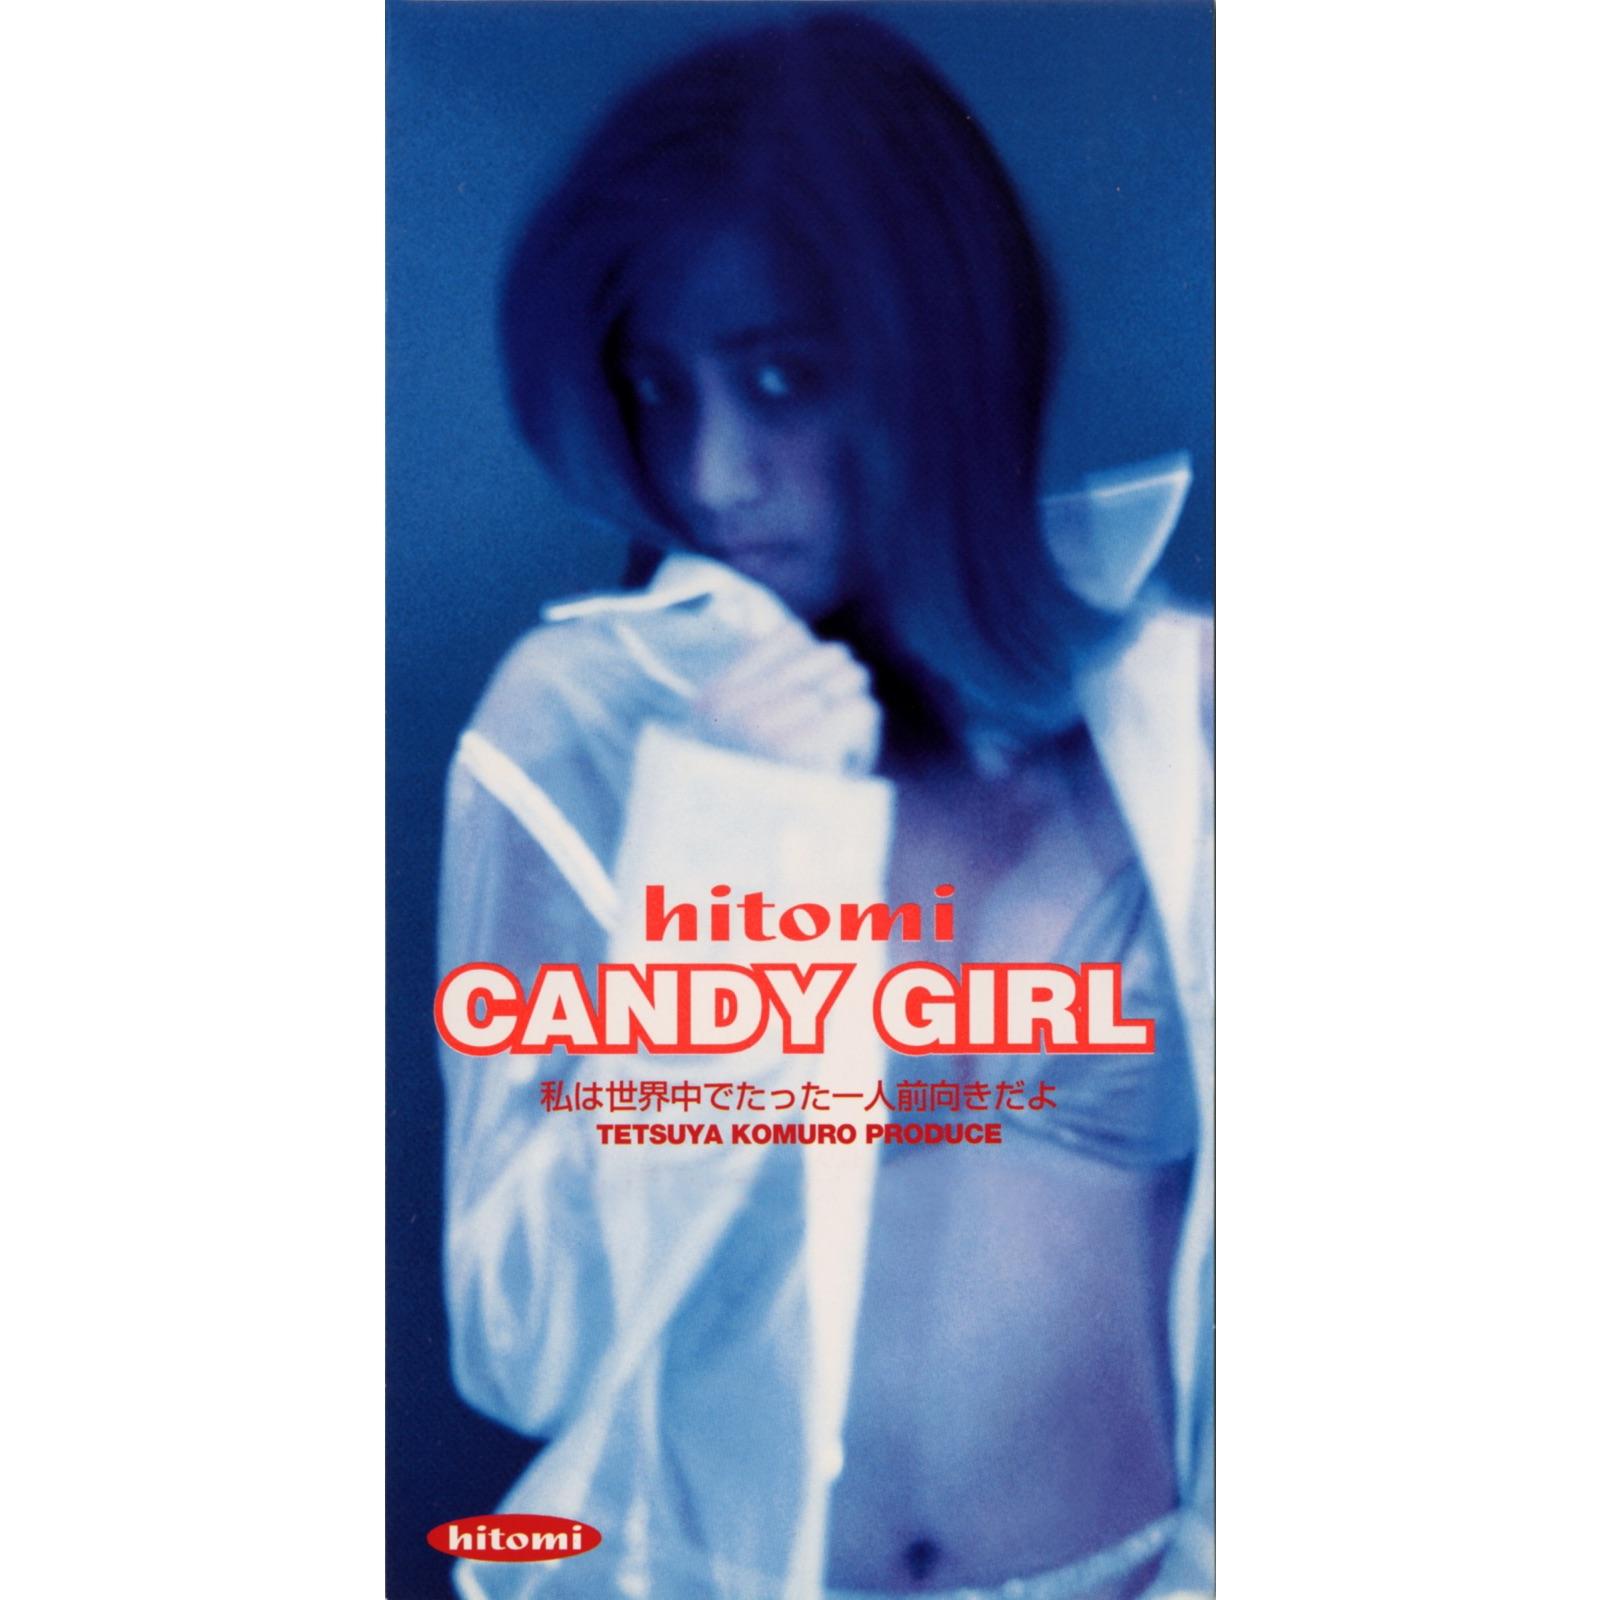 CANDY GIRL - Single